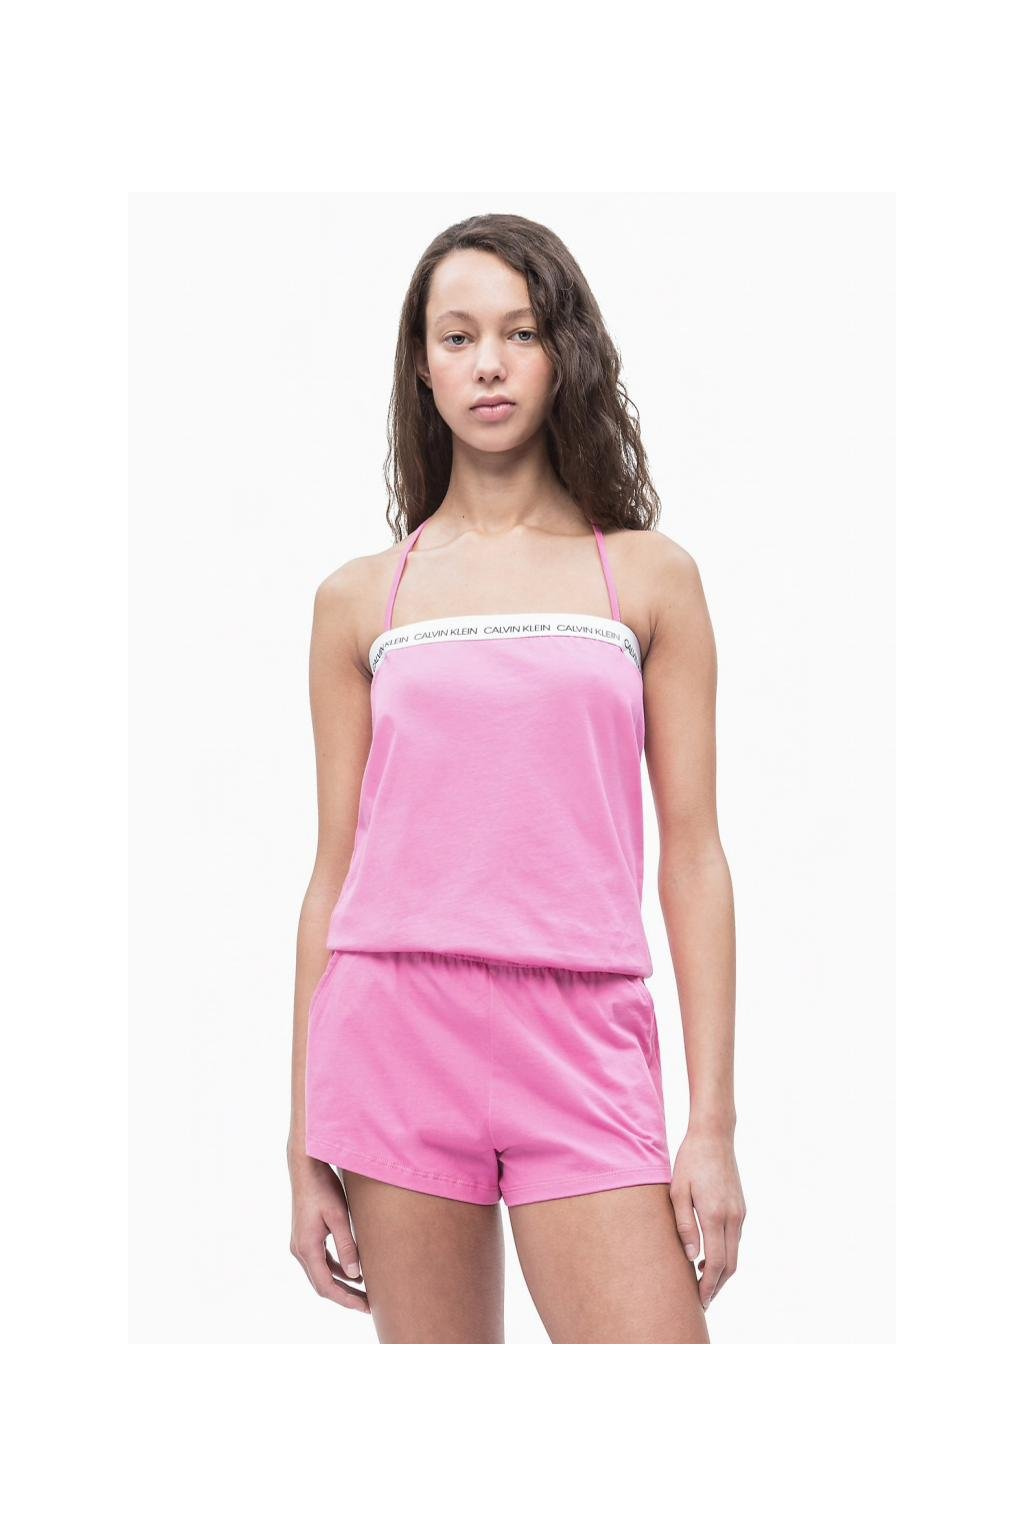 Calvin Klein romper - phlox pink